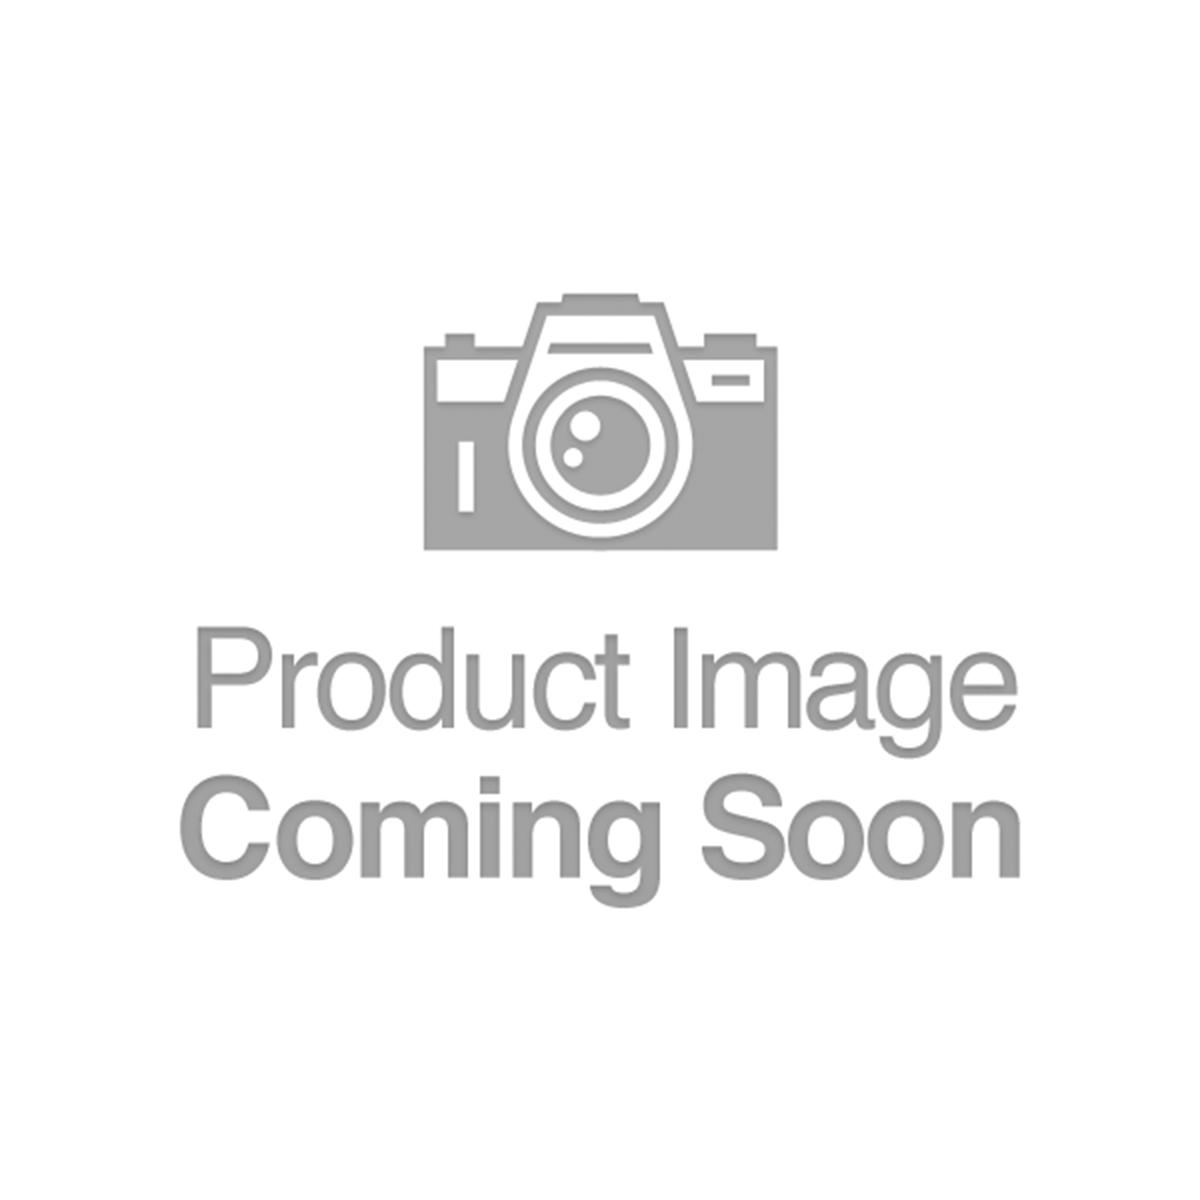 FR. 2407 $500 1928 Gold Certificate  PMG 35